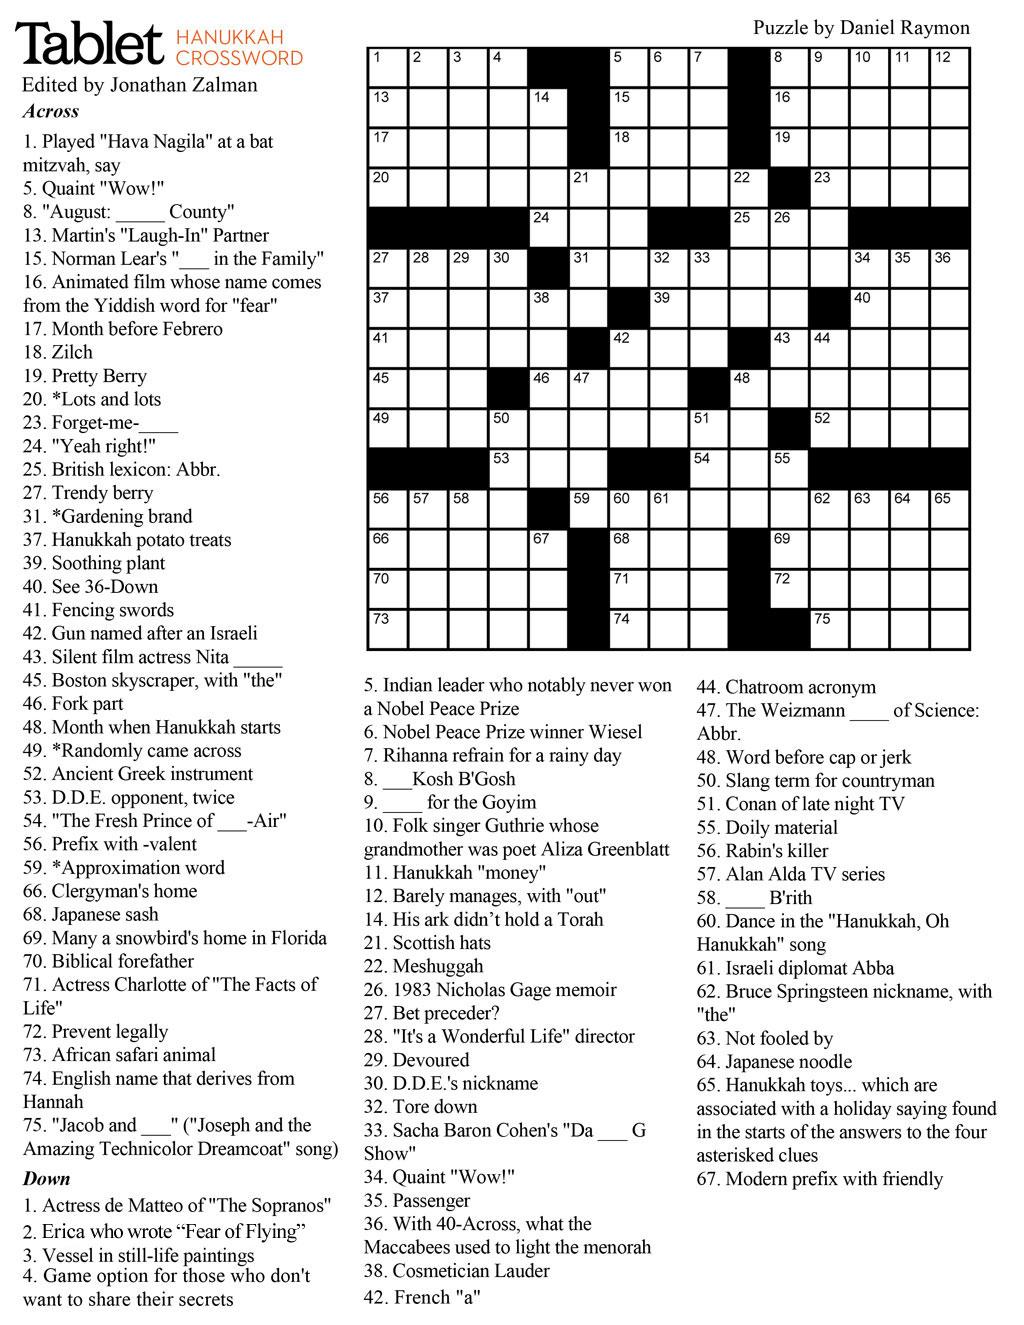 Hanukkah Crossword - Printable Crossword Clue